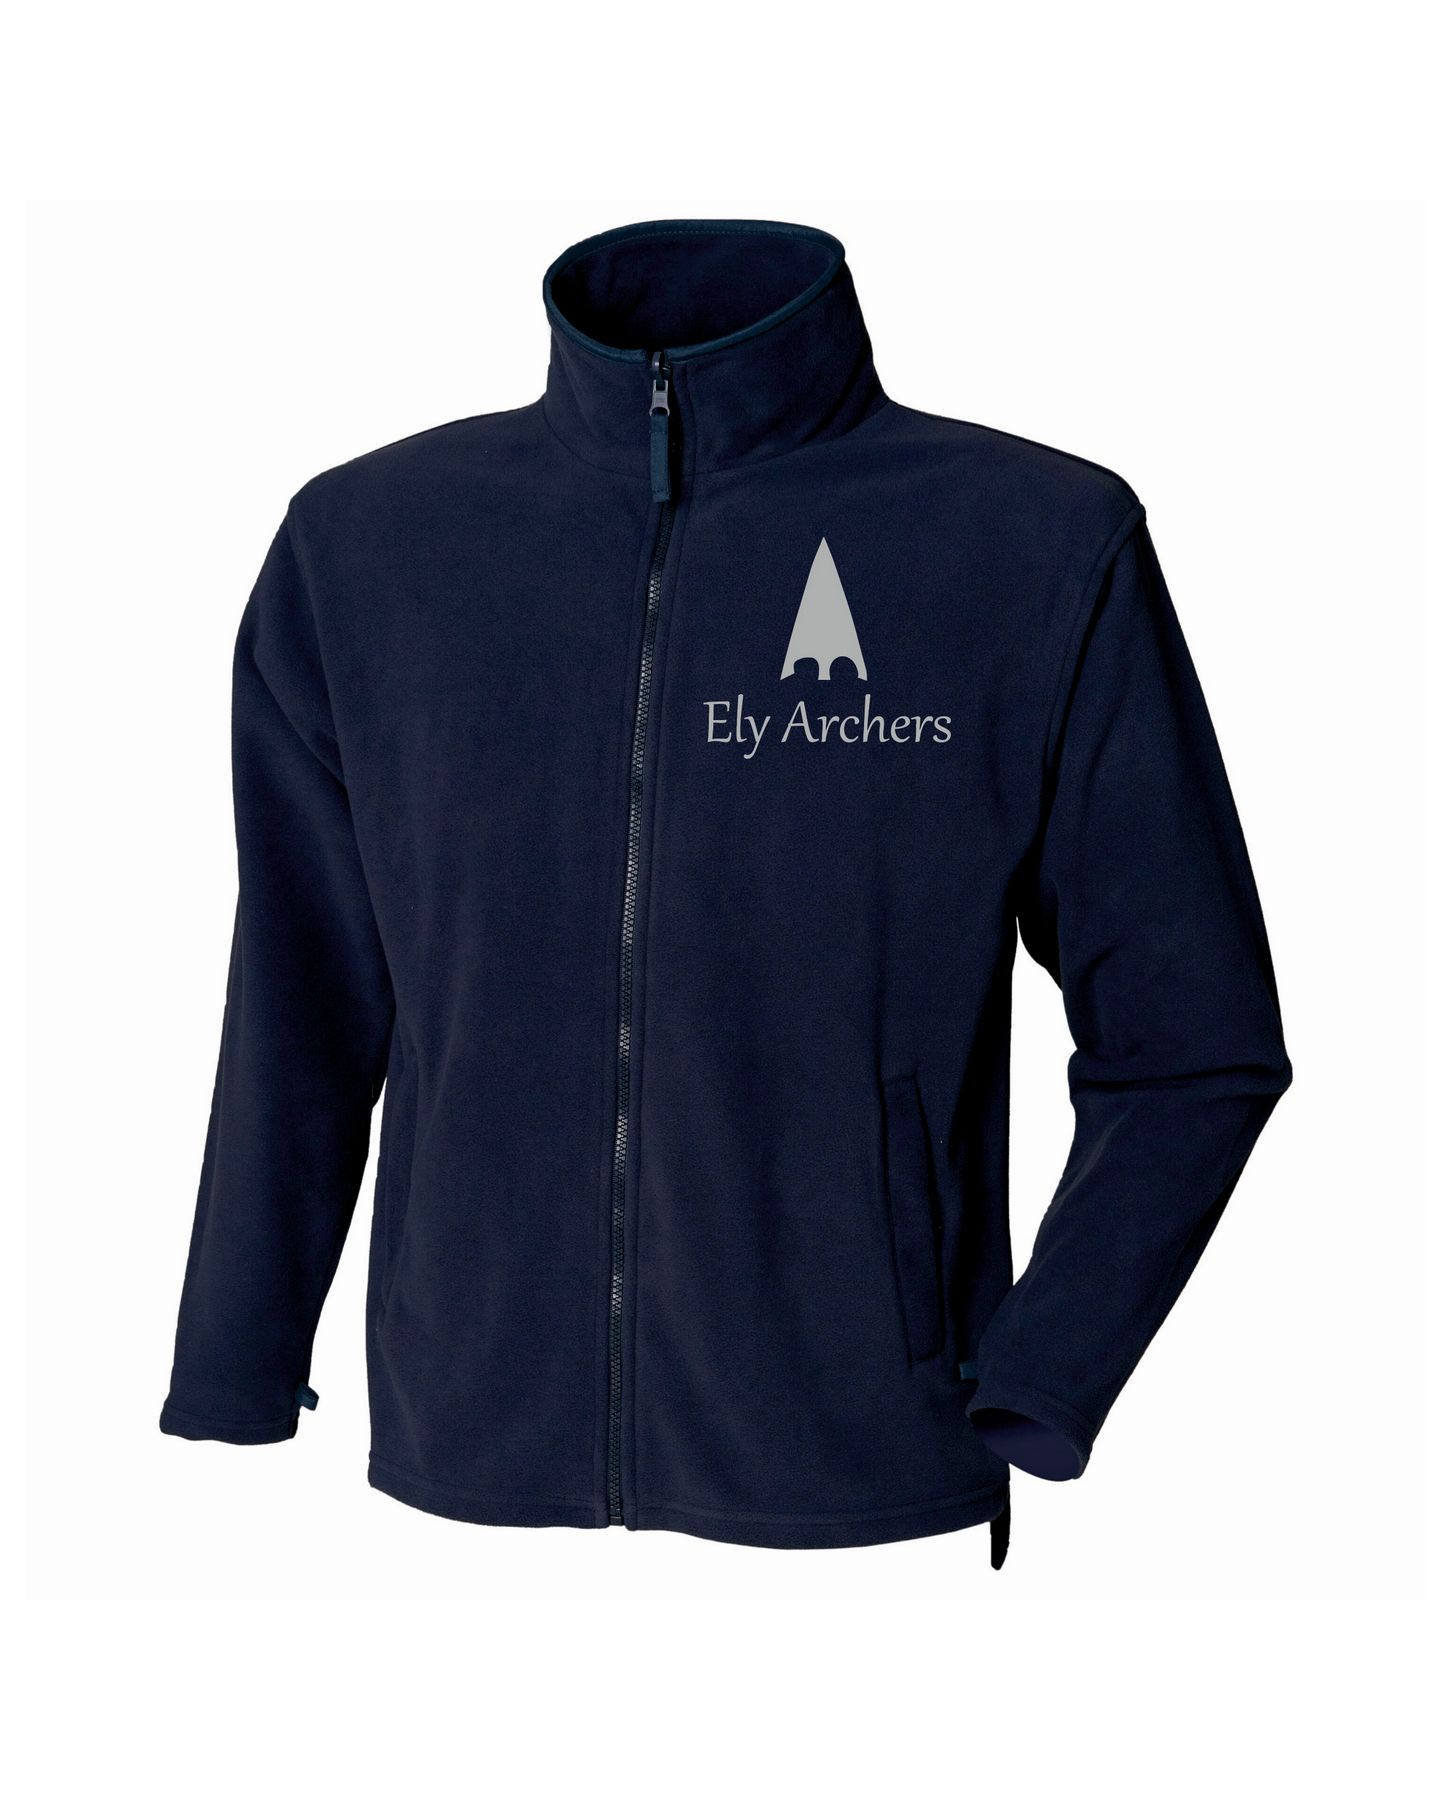 Ely Archers Henbury Full Zip Microfleece Jacket